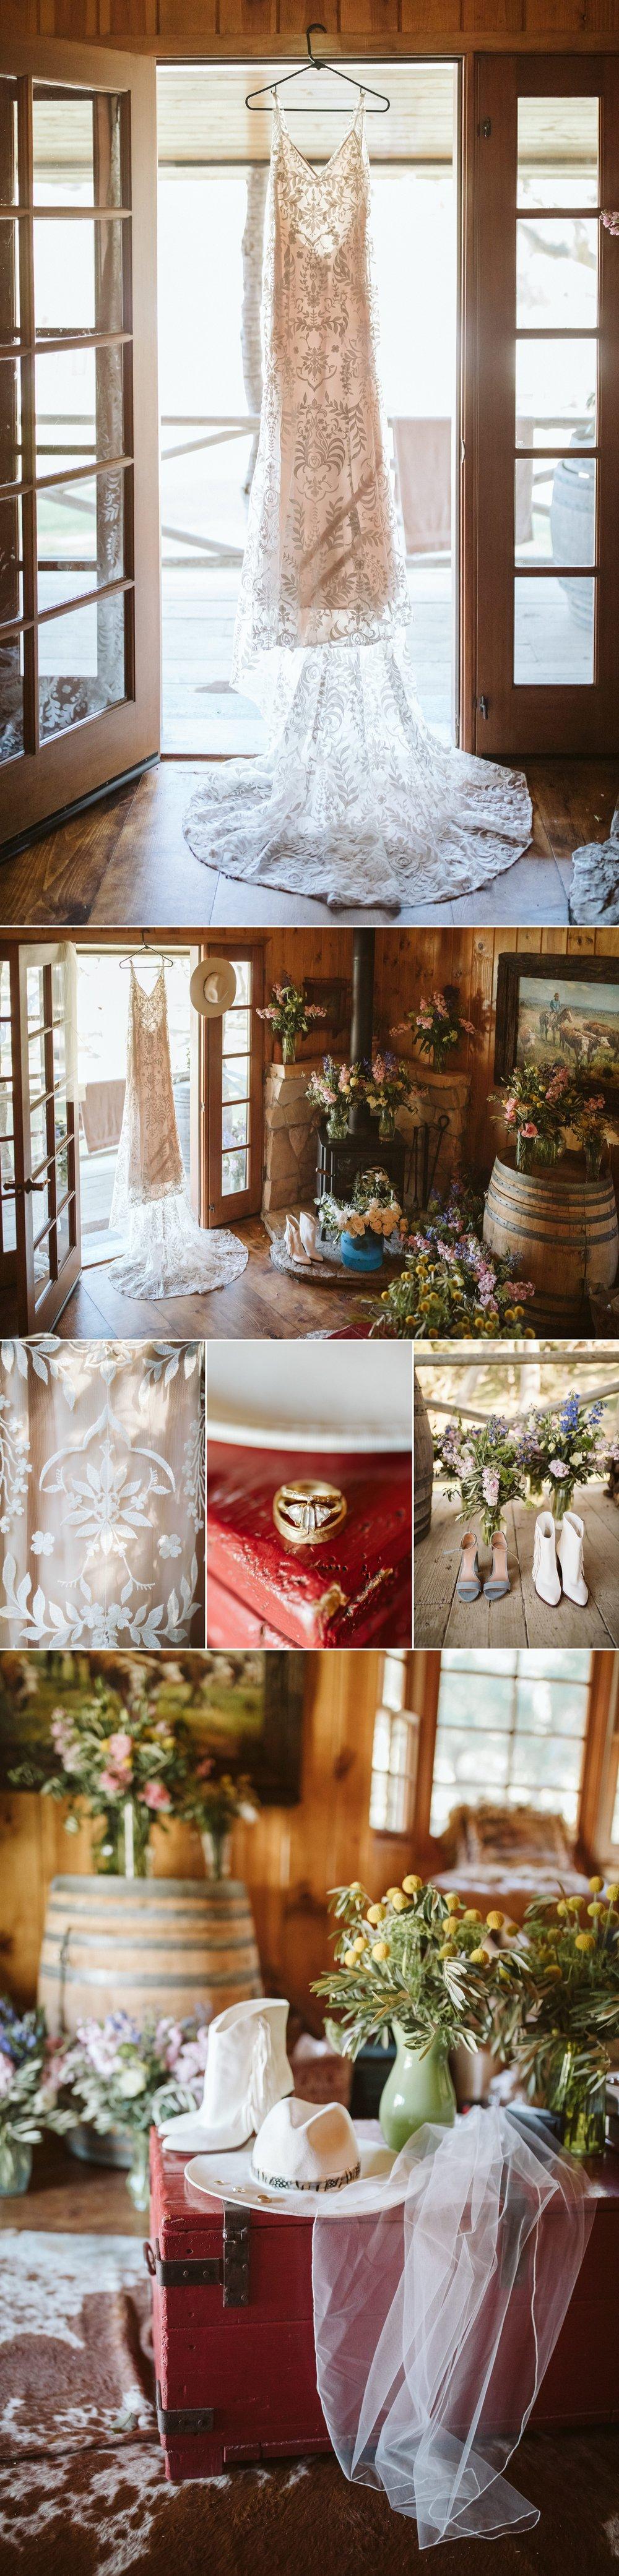 Colorful Barn Wedding at Jalama Canon Ranch- Lompoc- Santa Barbara- Geoff & Lauren 1.jpg